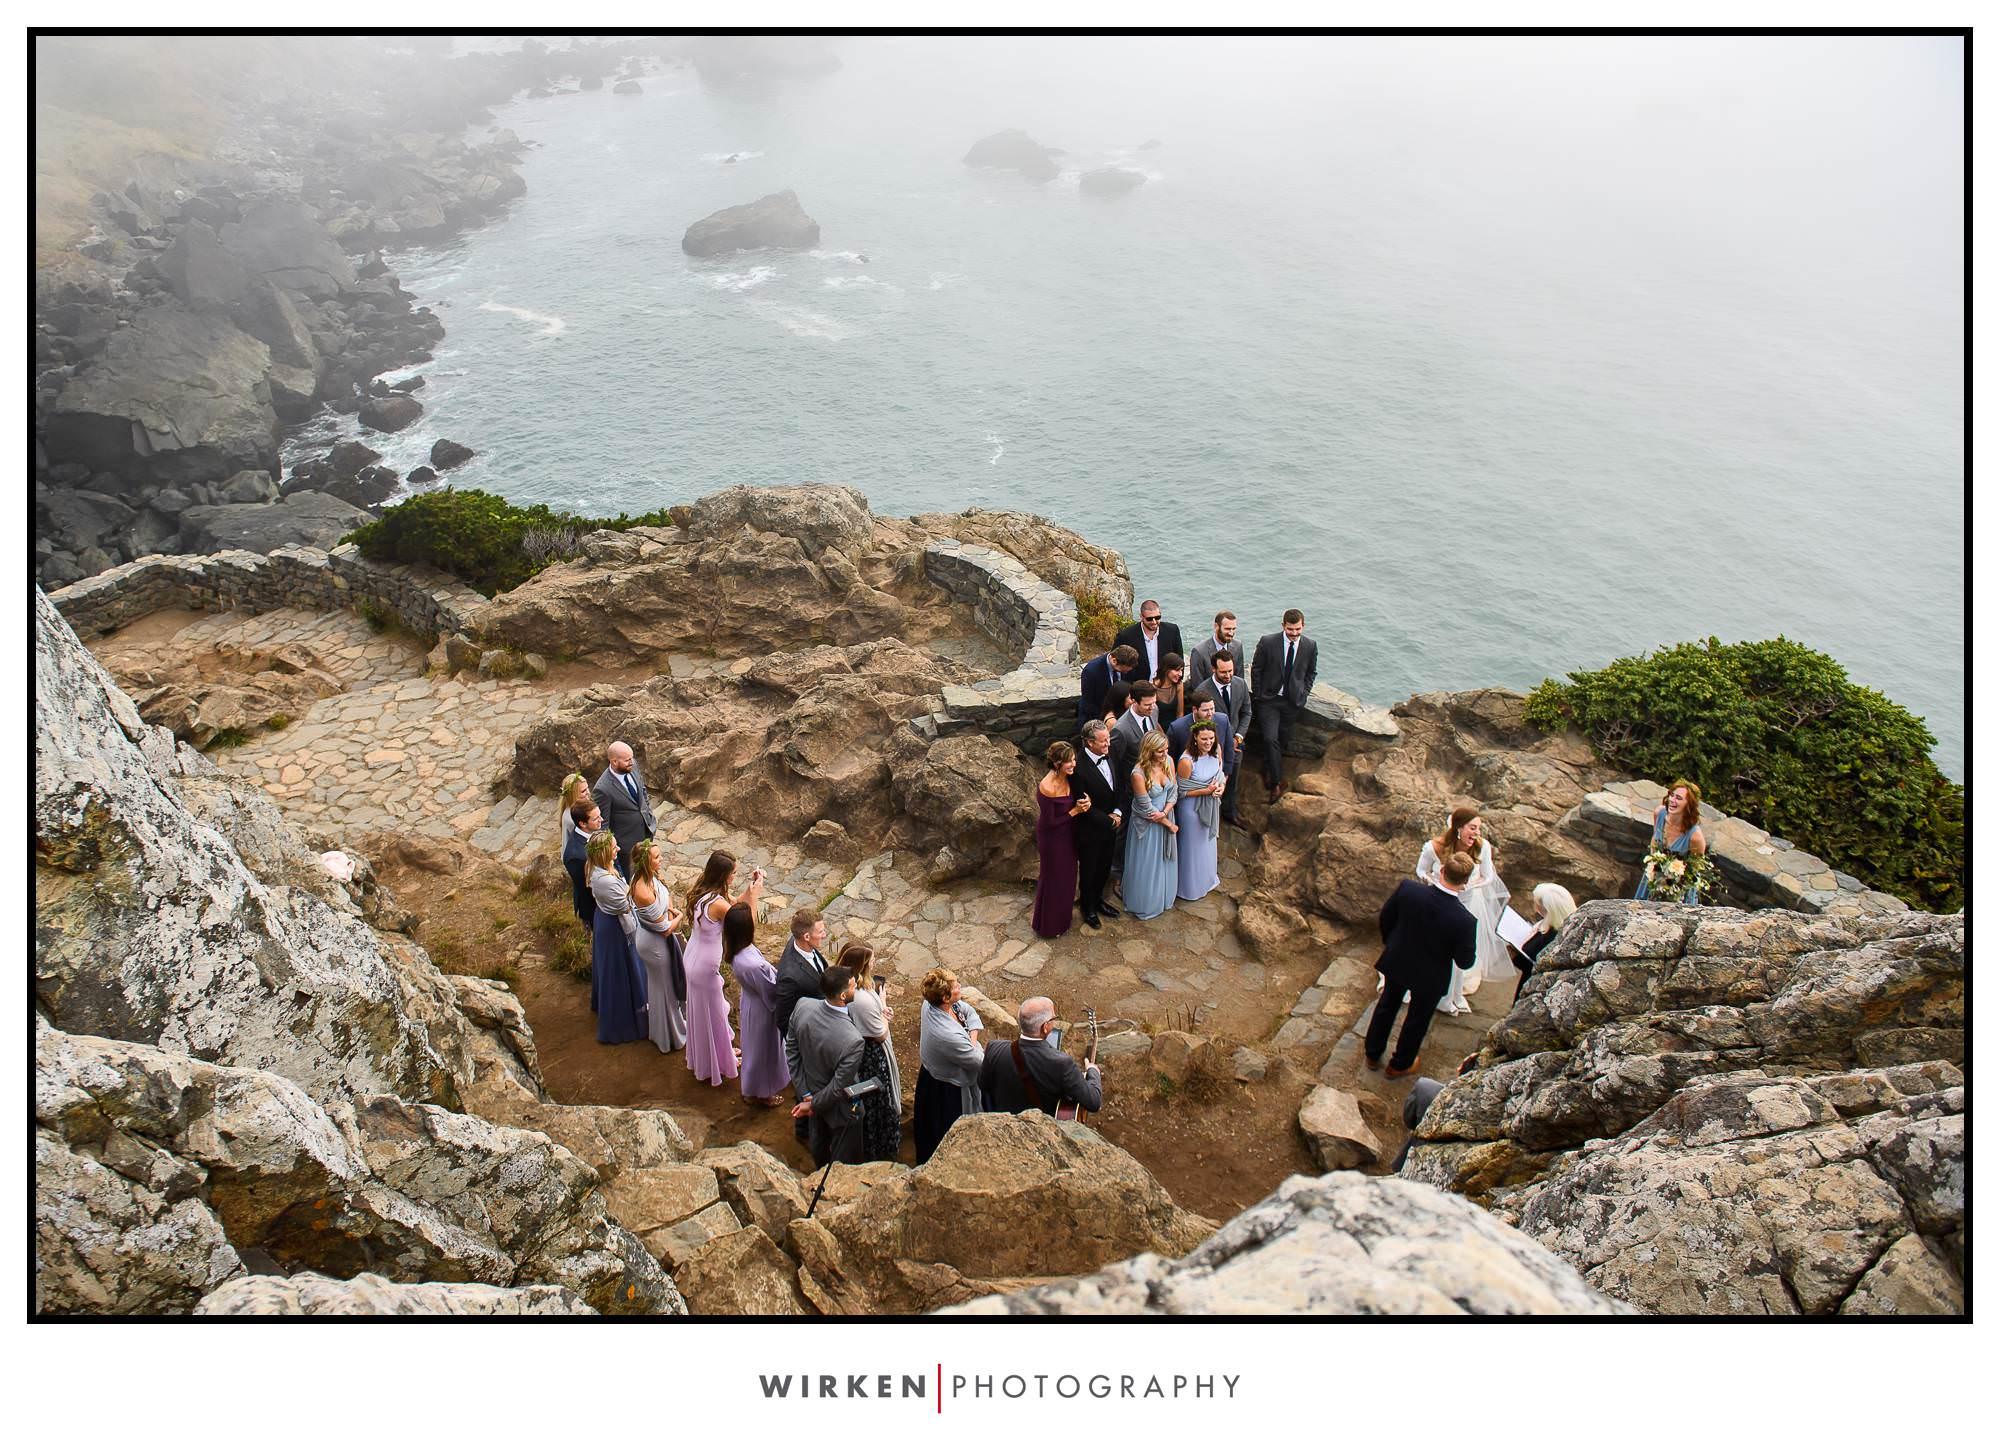 Patrick's Point Park wedding ceremony on Wedding Rock